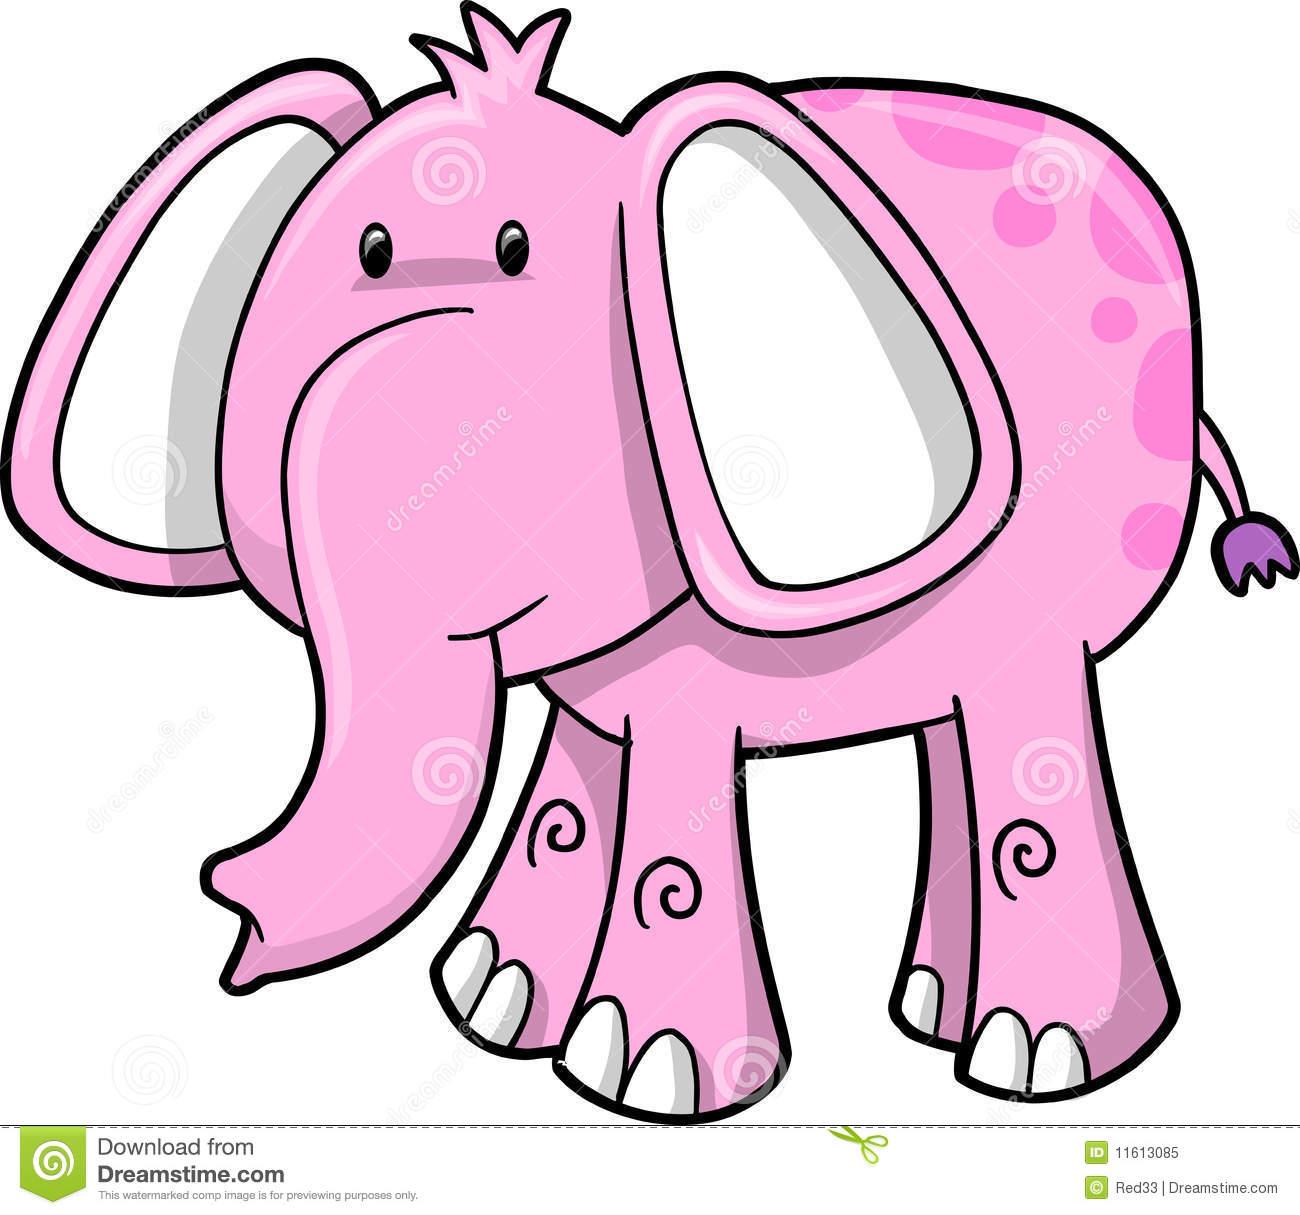 Pink Elephant Clip Art   Clipart Panda - Free Clipart Images